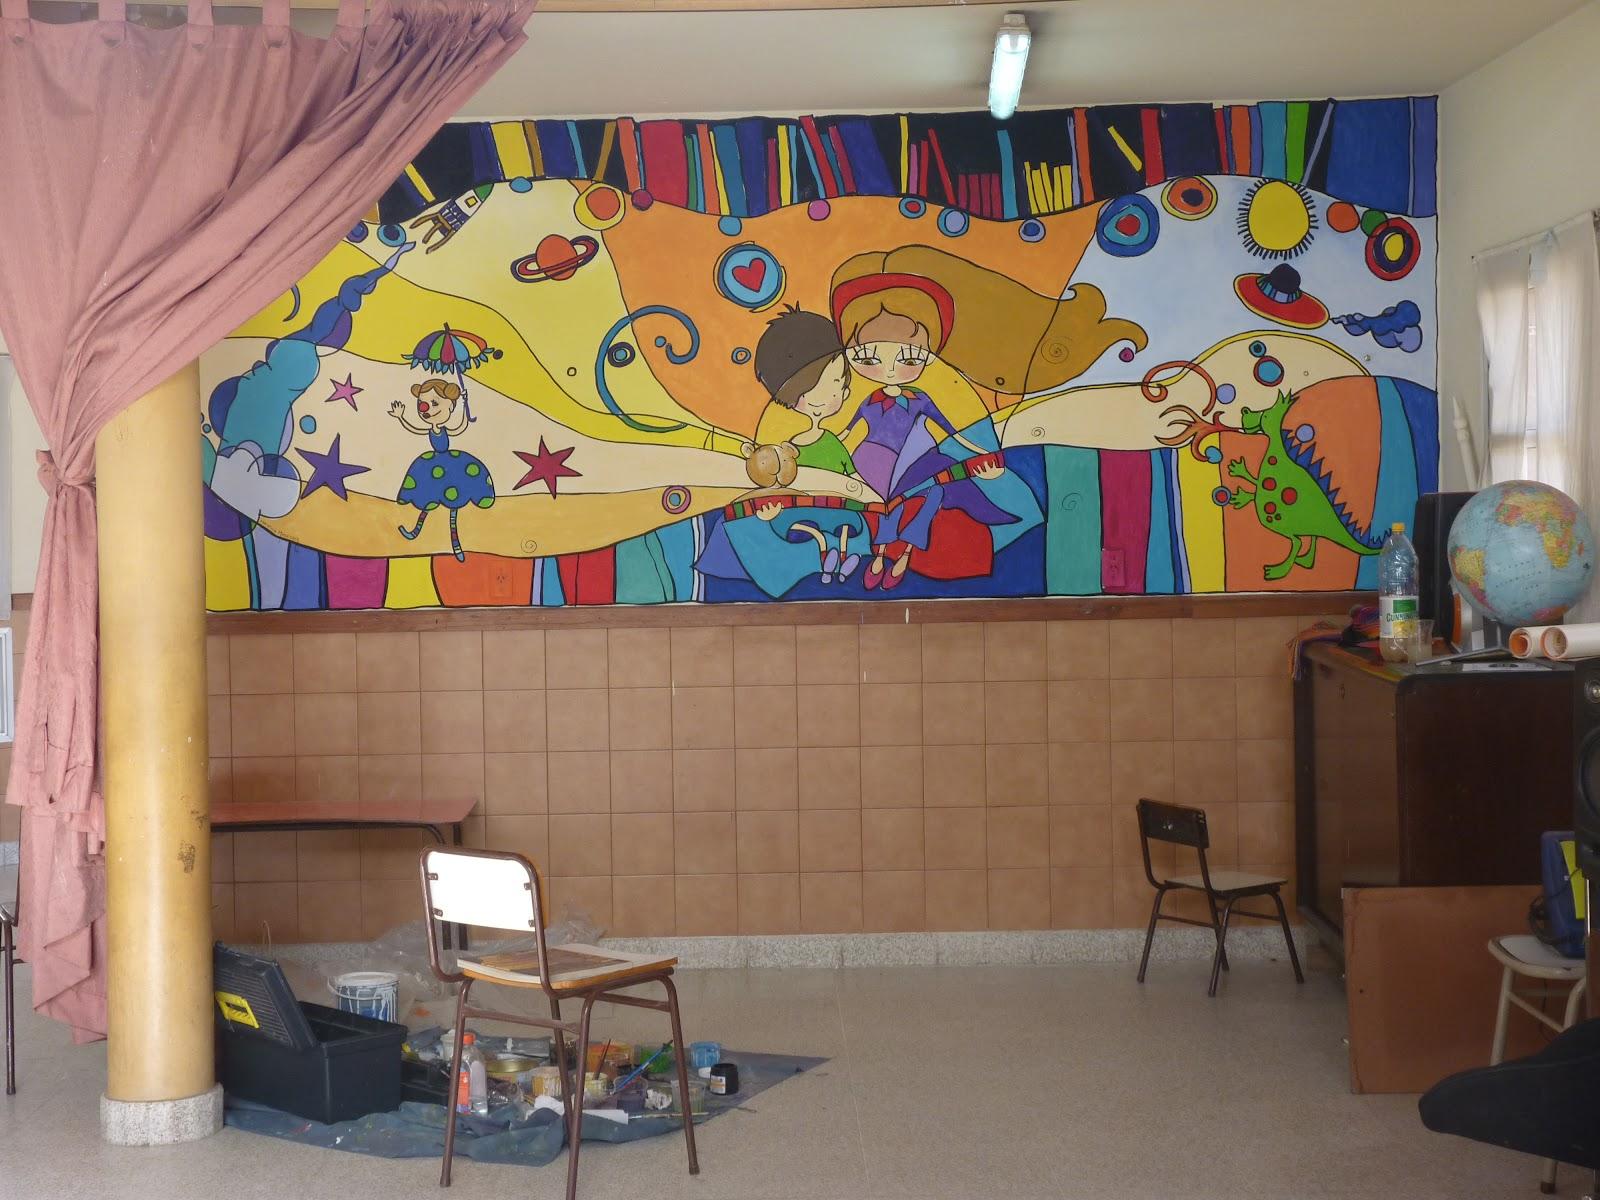 Murales mural en jard n de infantes en el olimpo for Jardines de olimpo